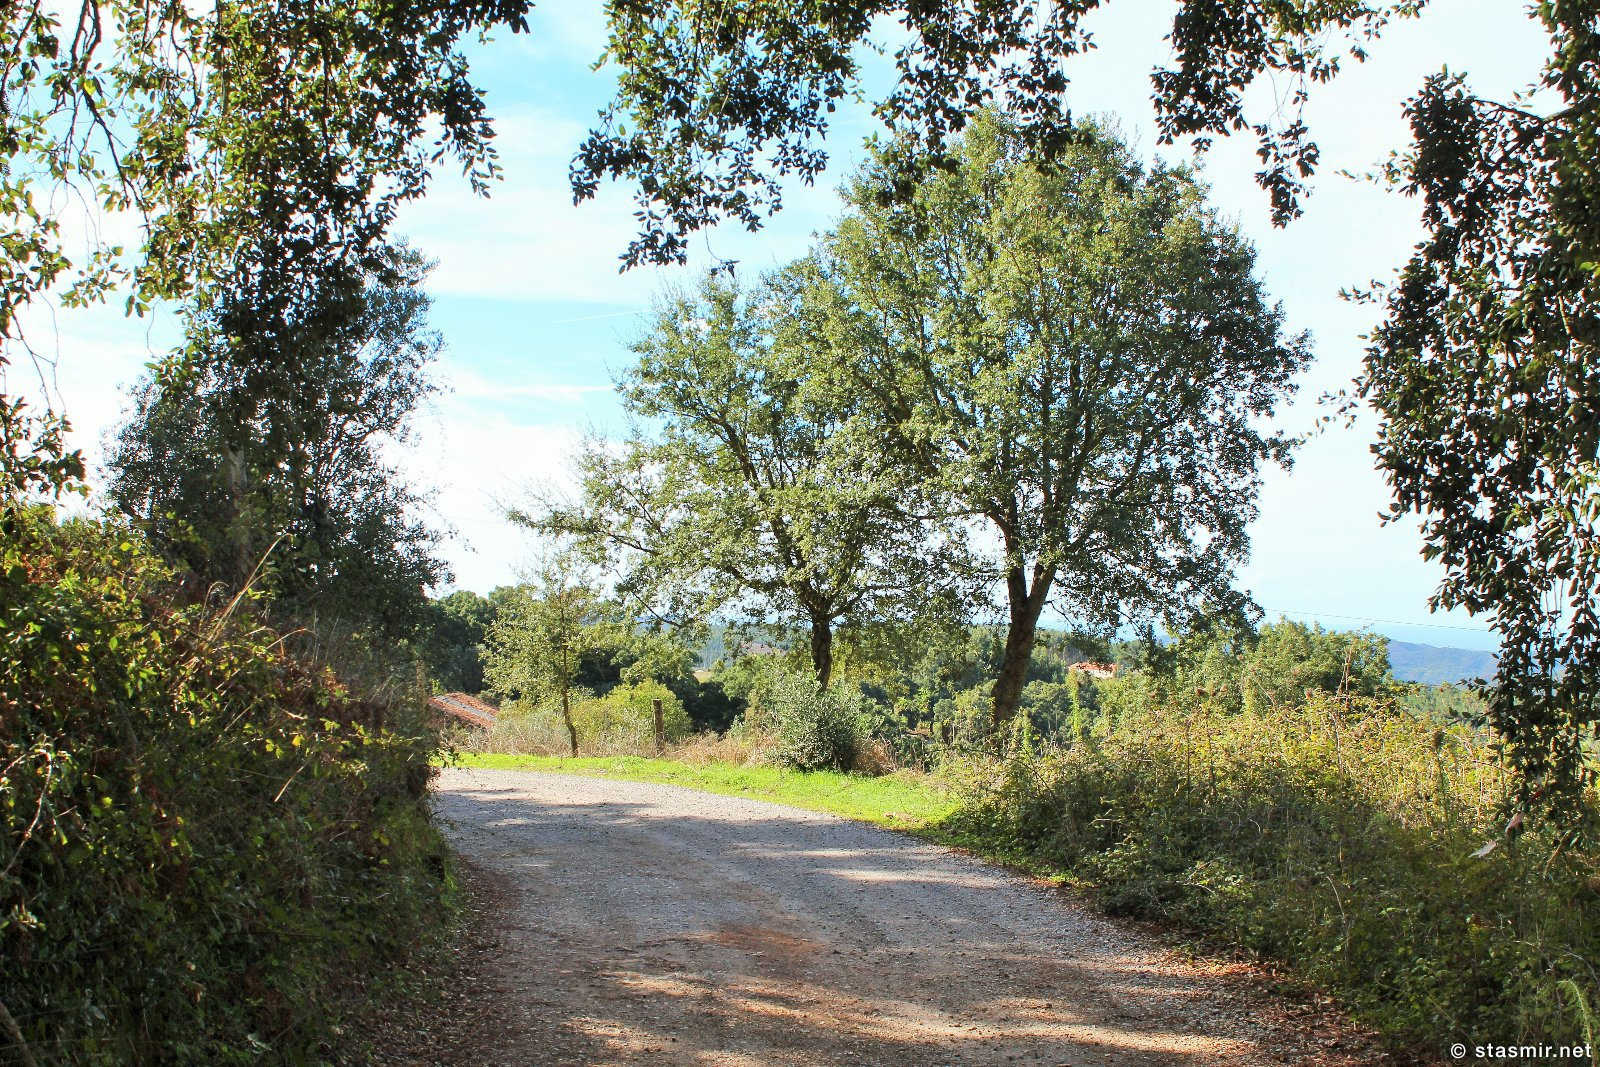 пеший маршрут вокруг Мармелете, Альгарве, фото Стасмир, photo Stasmir, Percurso Pedestre de Marmelete, Моншик, Мармелете, дубы в Португалии